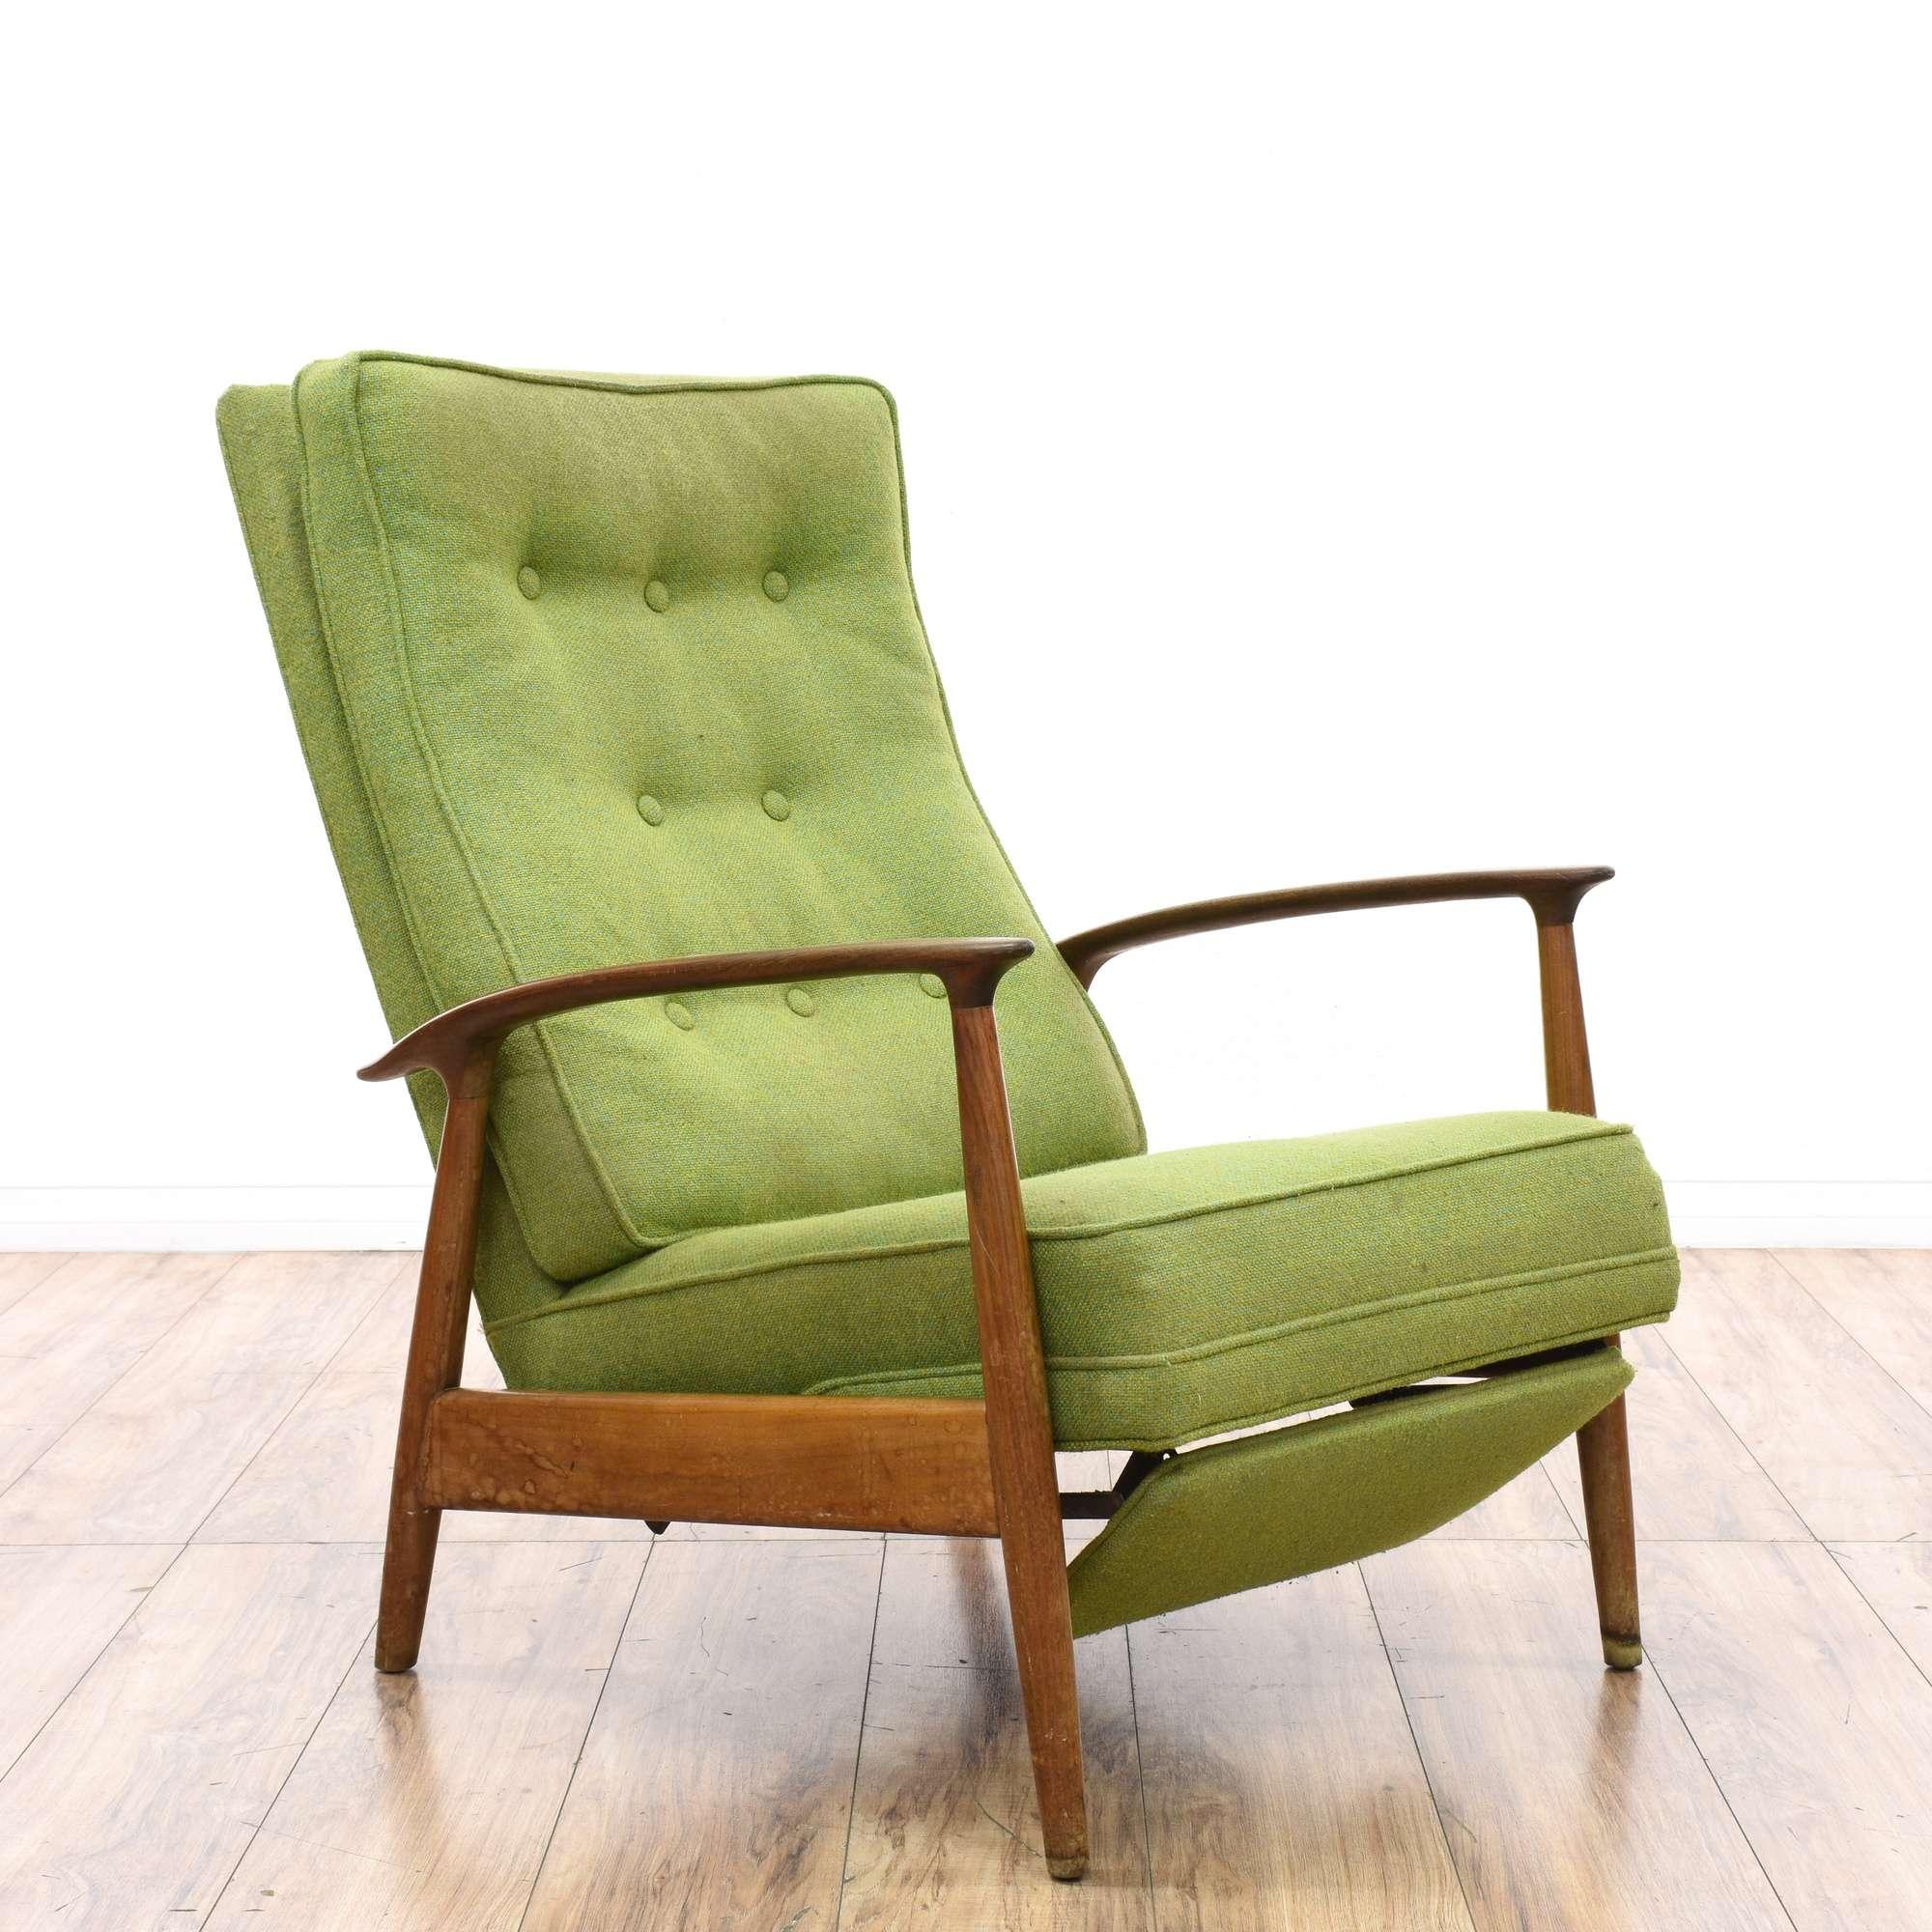 Milo Baughman Style Mid Century Modern Recliner Loveseat Online Auctions San Diego